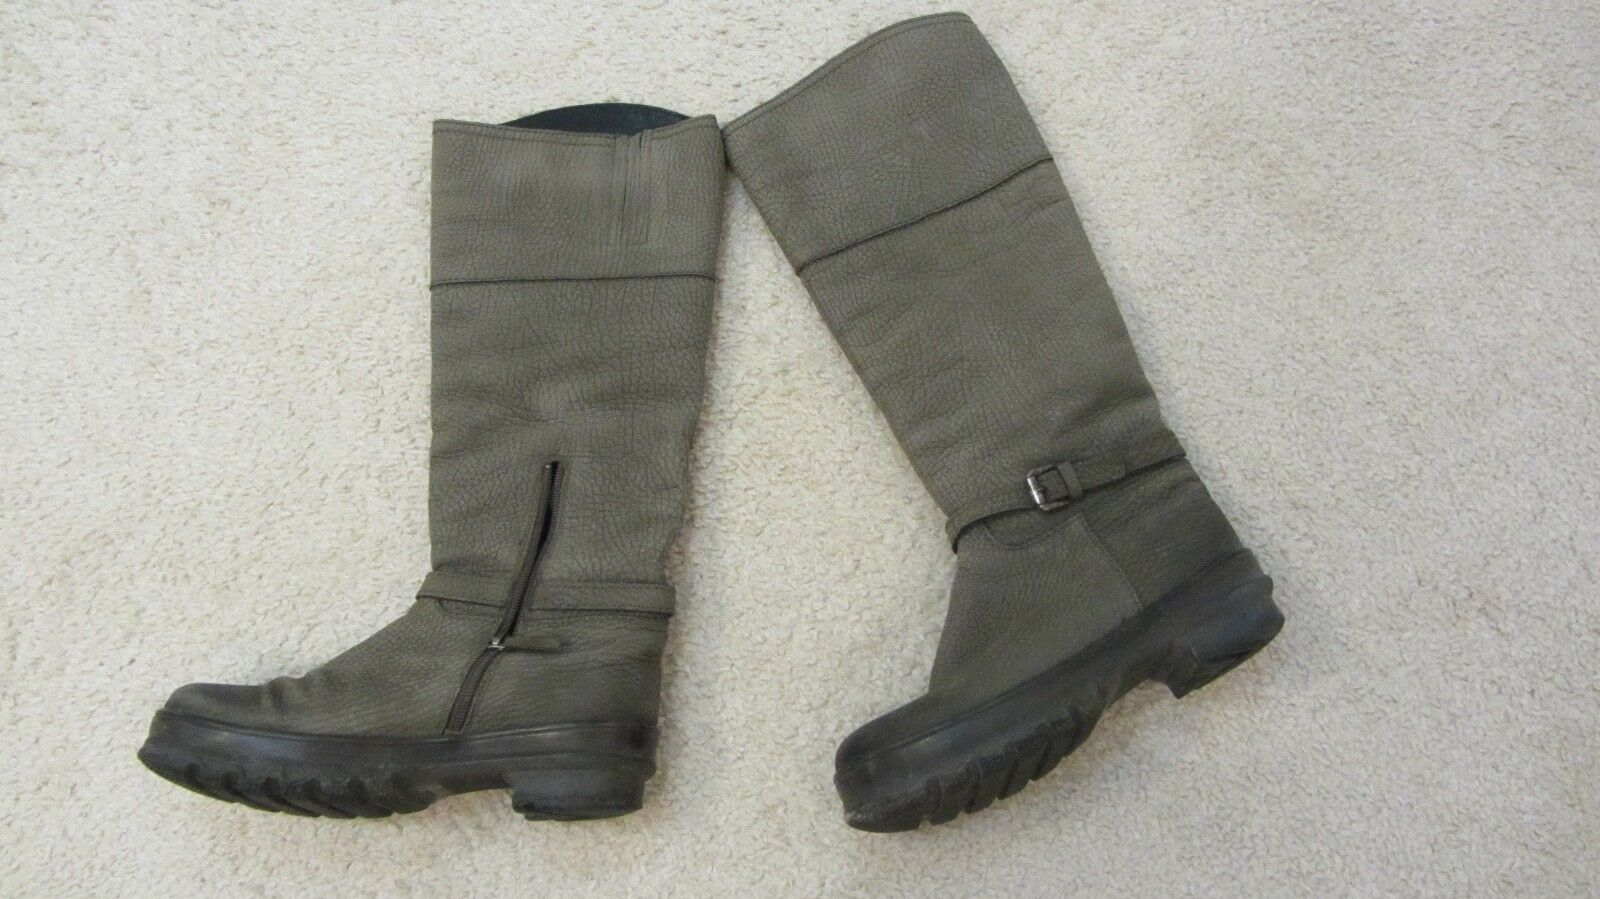 KENNEL & SCHMENGER Stiefel Gr. D 37 Damen Schuhe Stiefel Leder